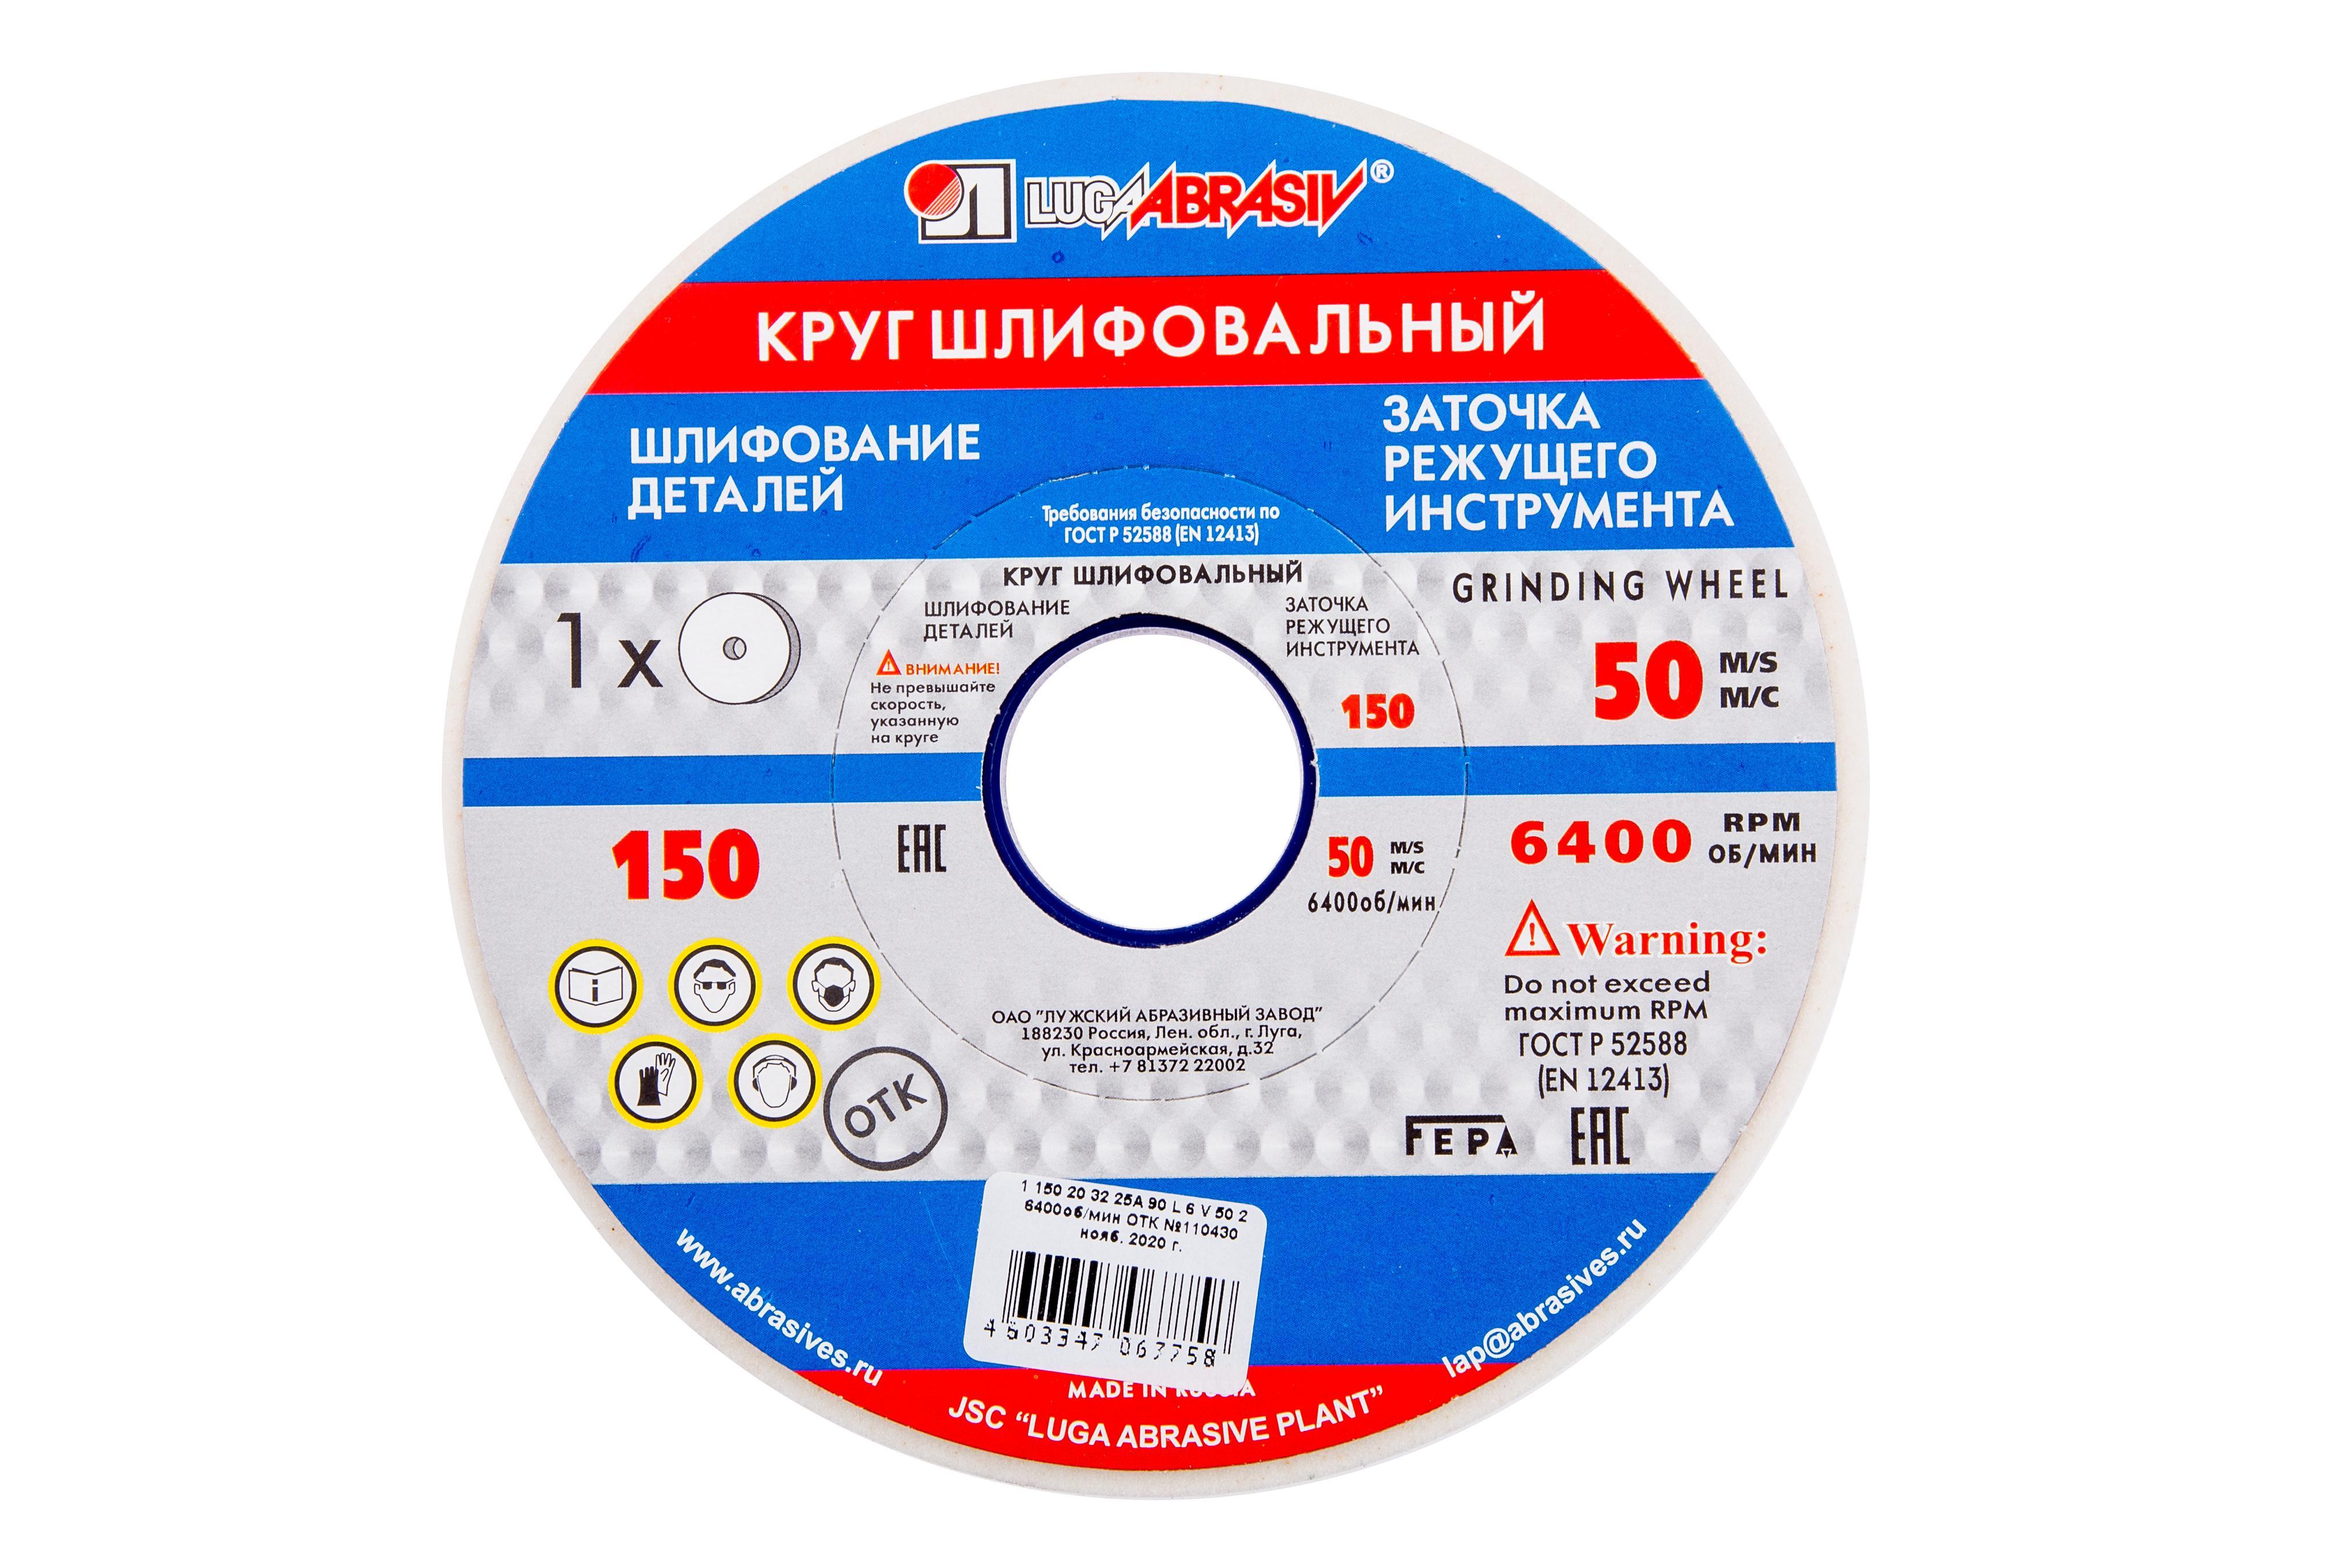 Круг шлифовальный ЛУГА-АБРАЗИВ 1 150 Х 20 Х 32 25А 90 k,l (16СМ) ваза mughal l 20 х 20 х 30 см